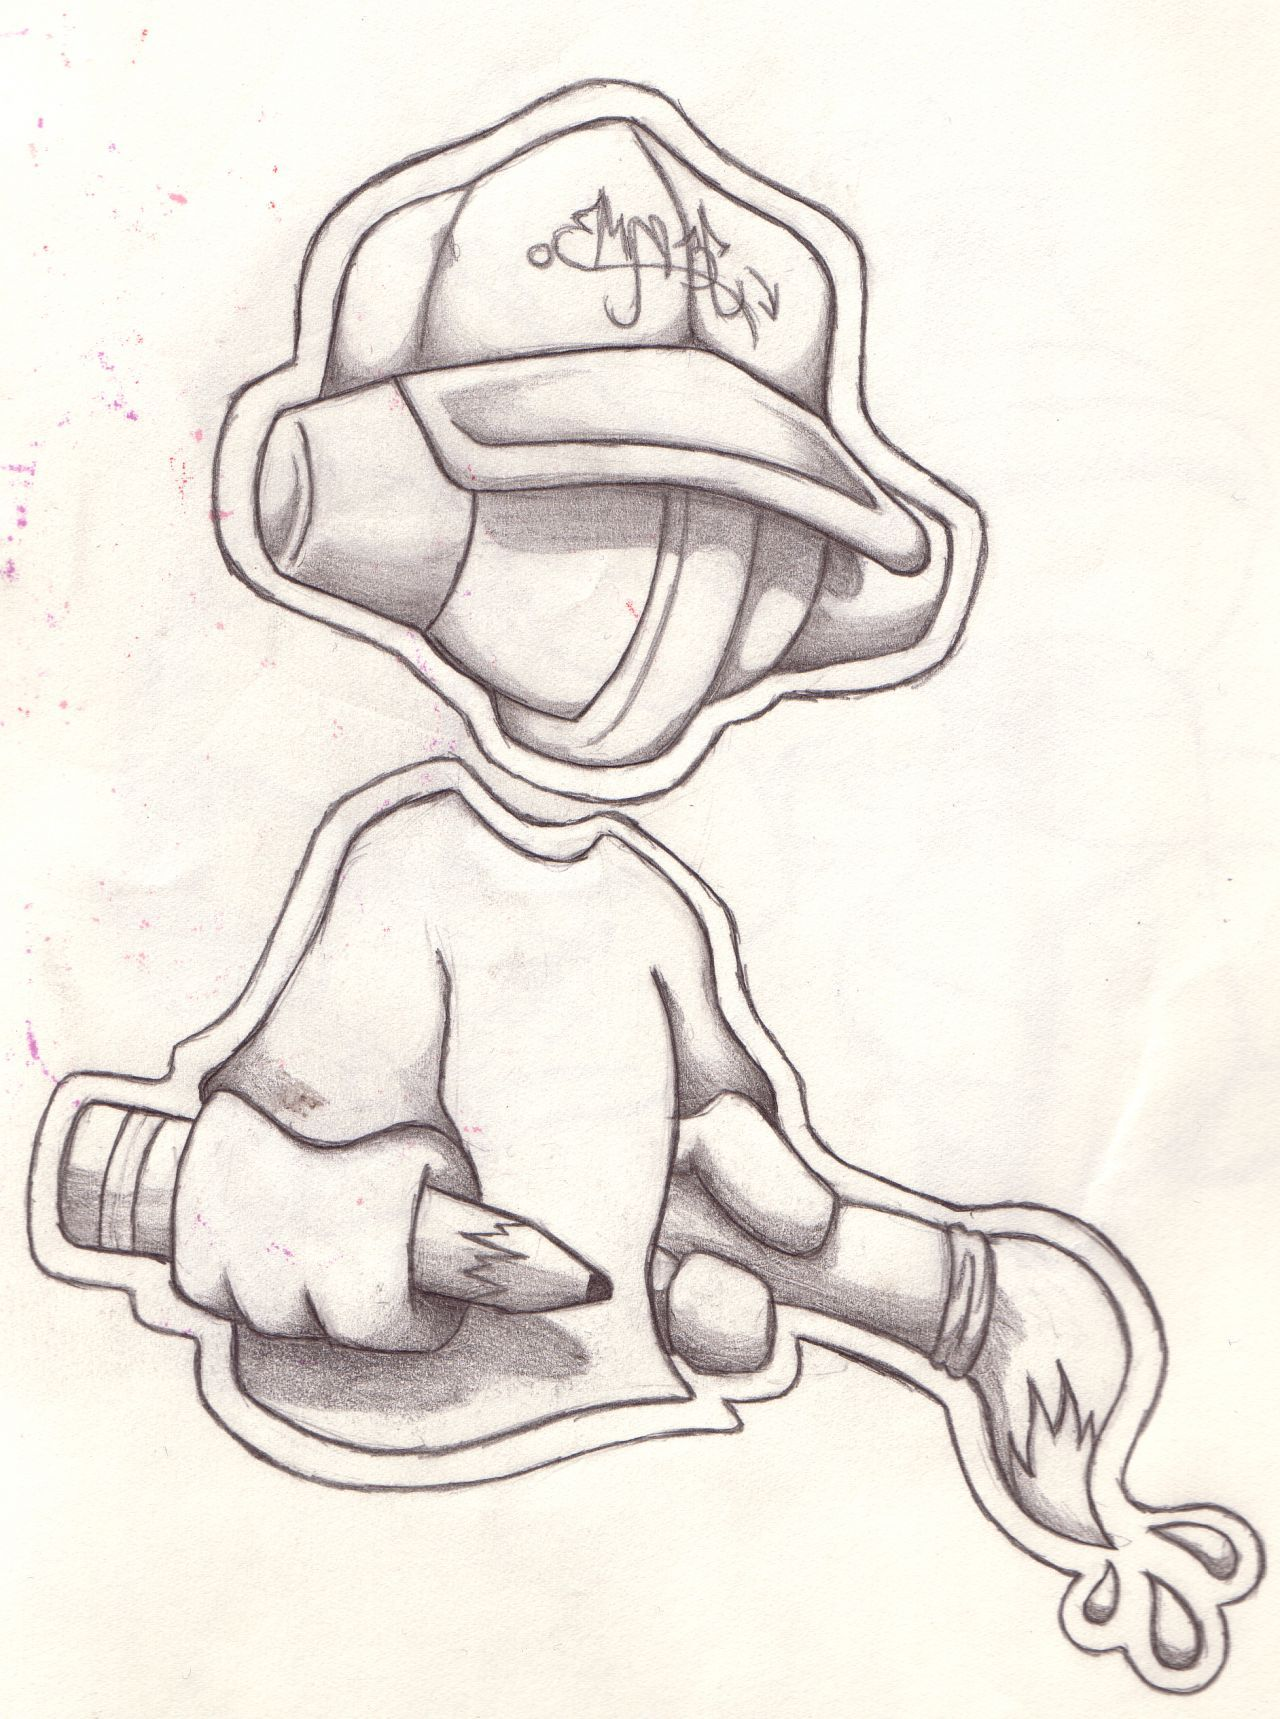 1280x1719 Gallery Cool Drawings Of Graffiti Characters,